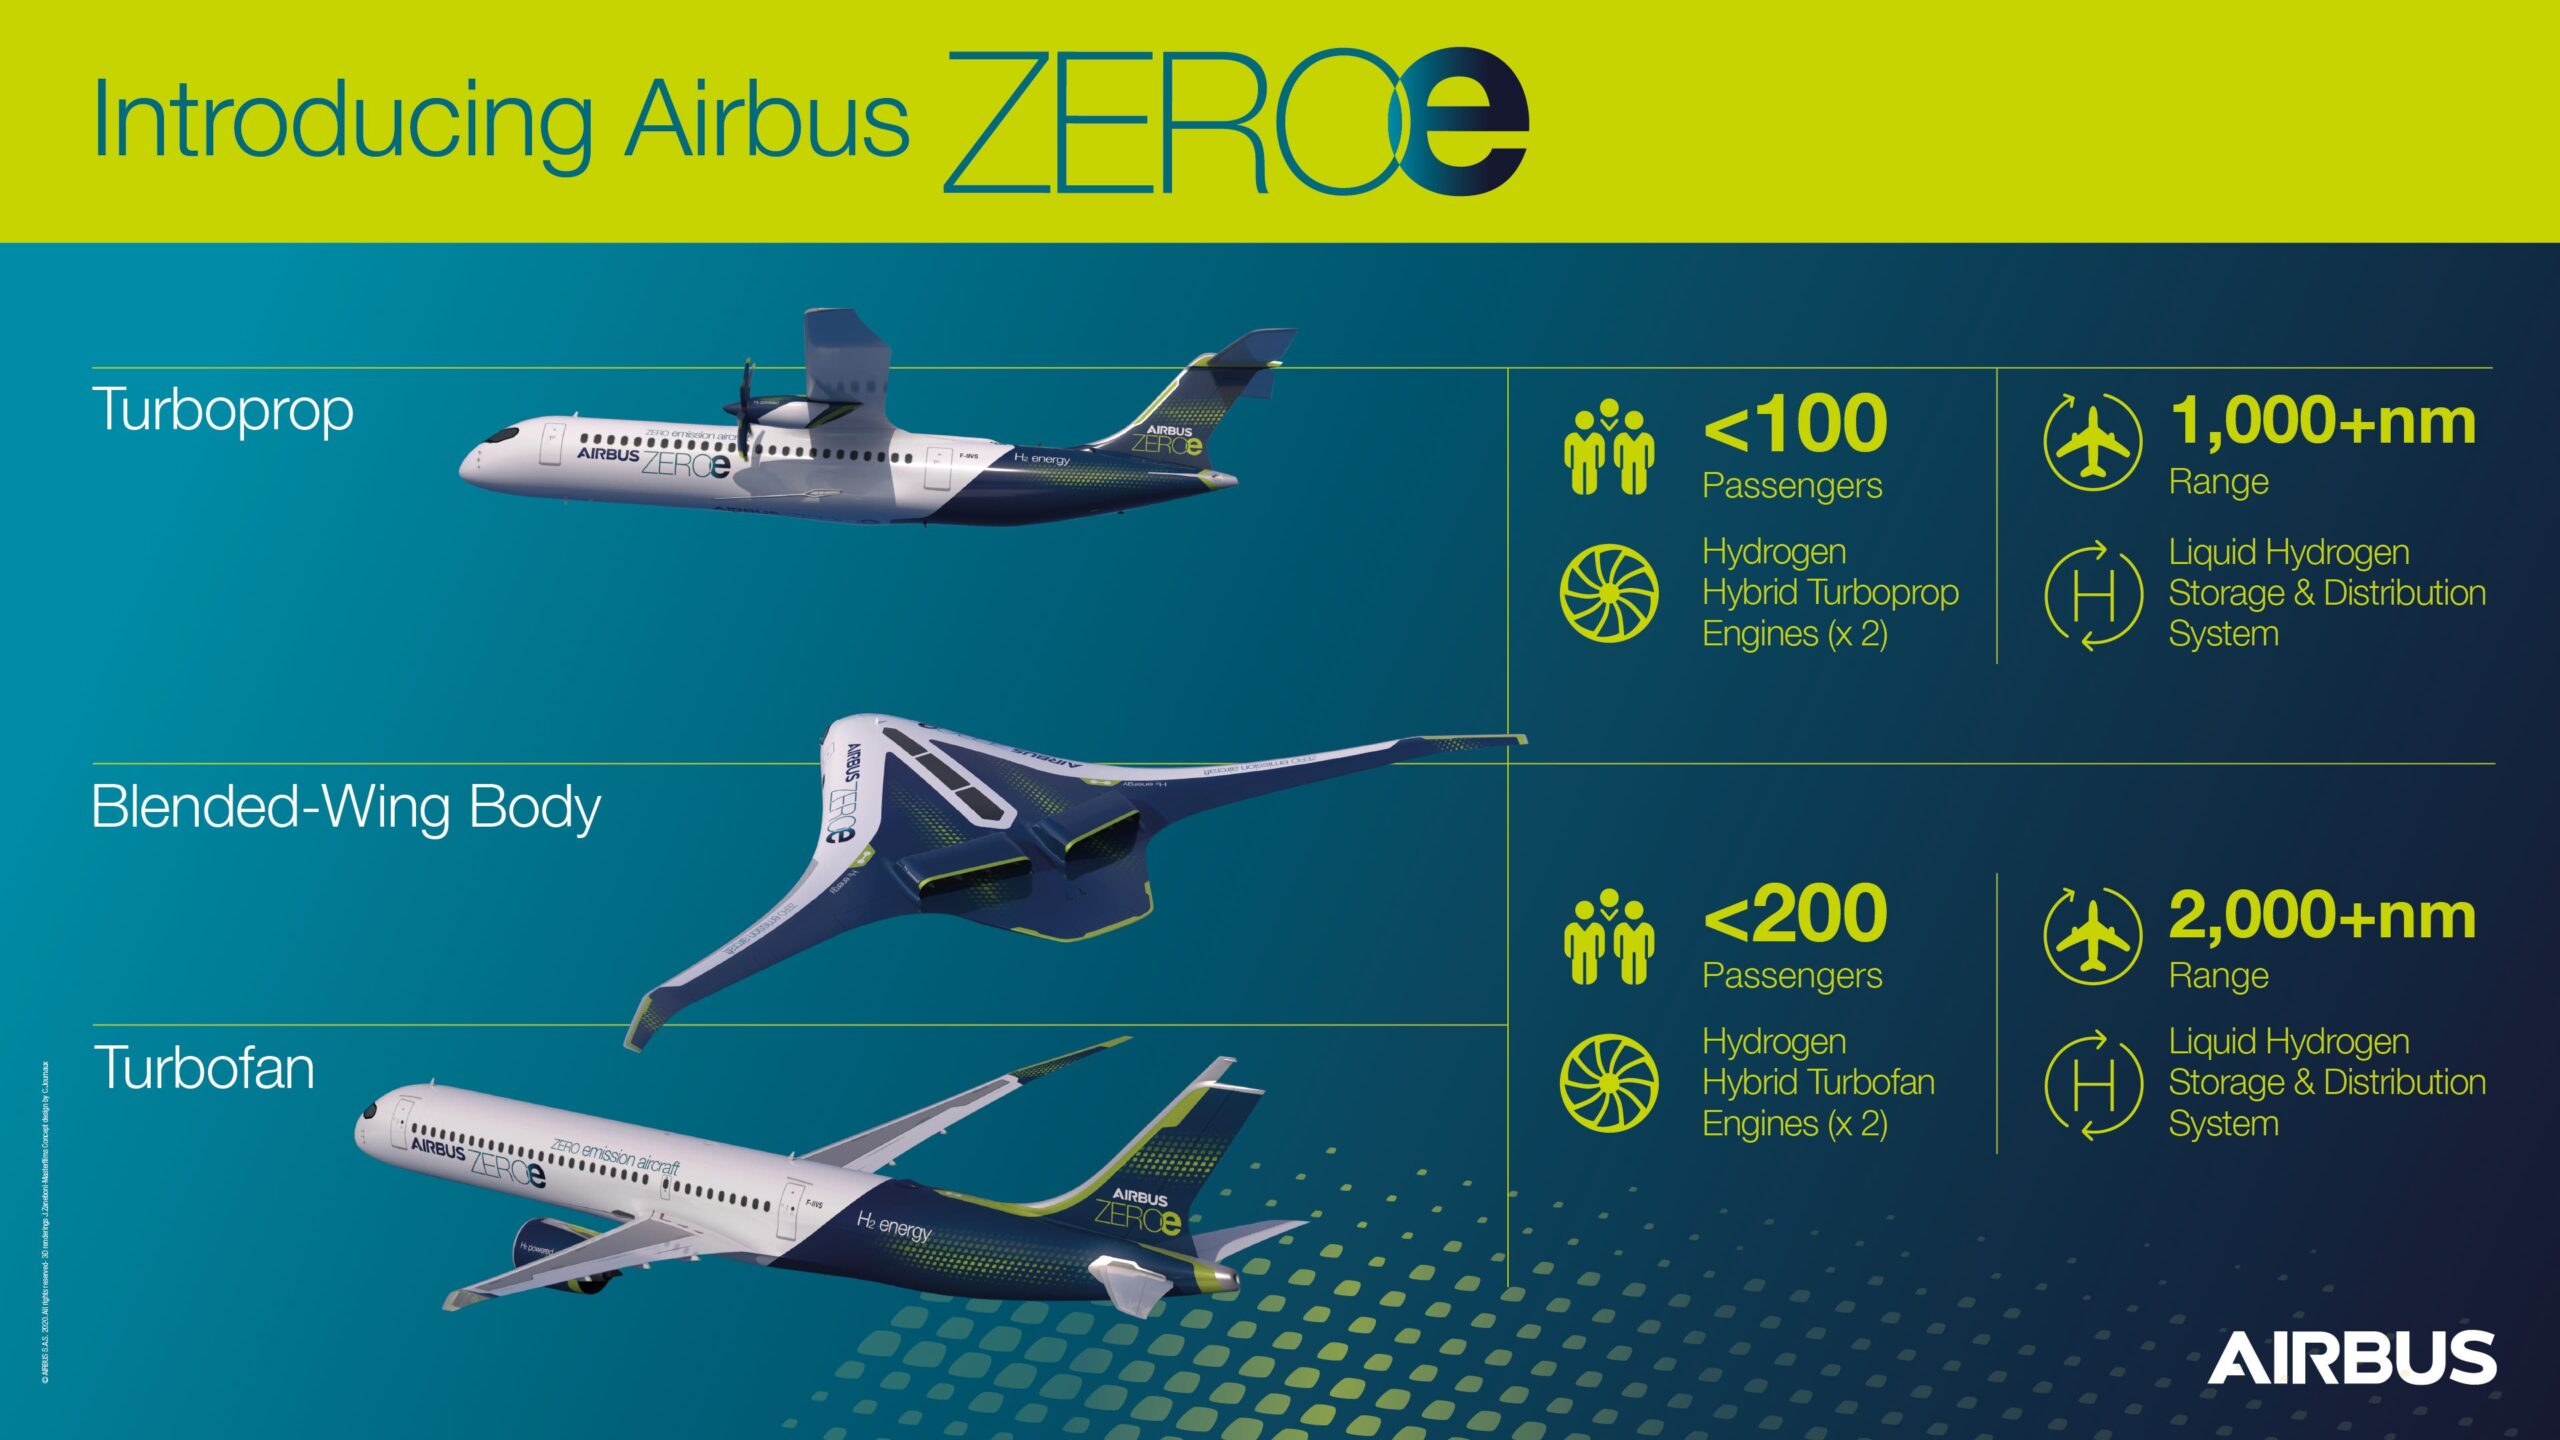 Introducing Airbus ZEROe